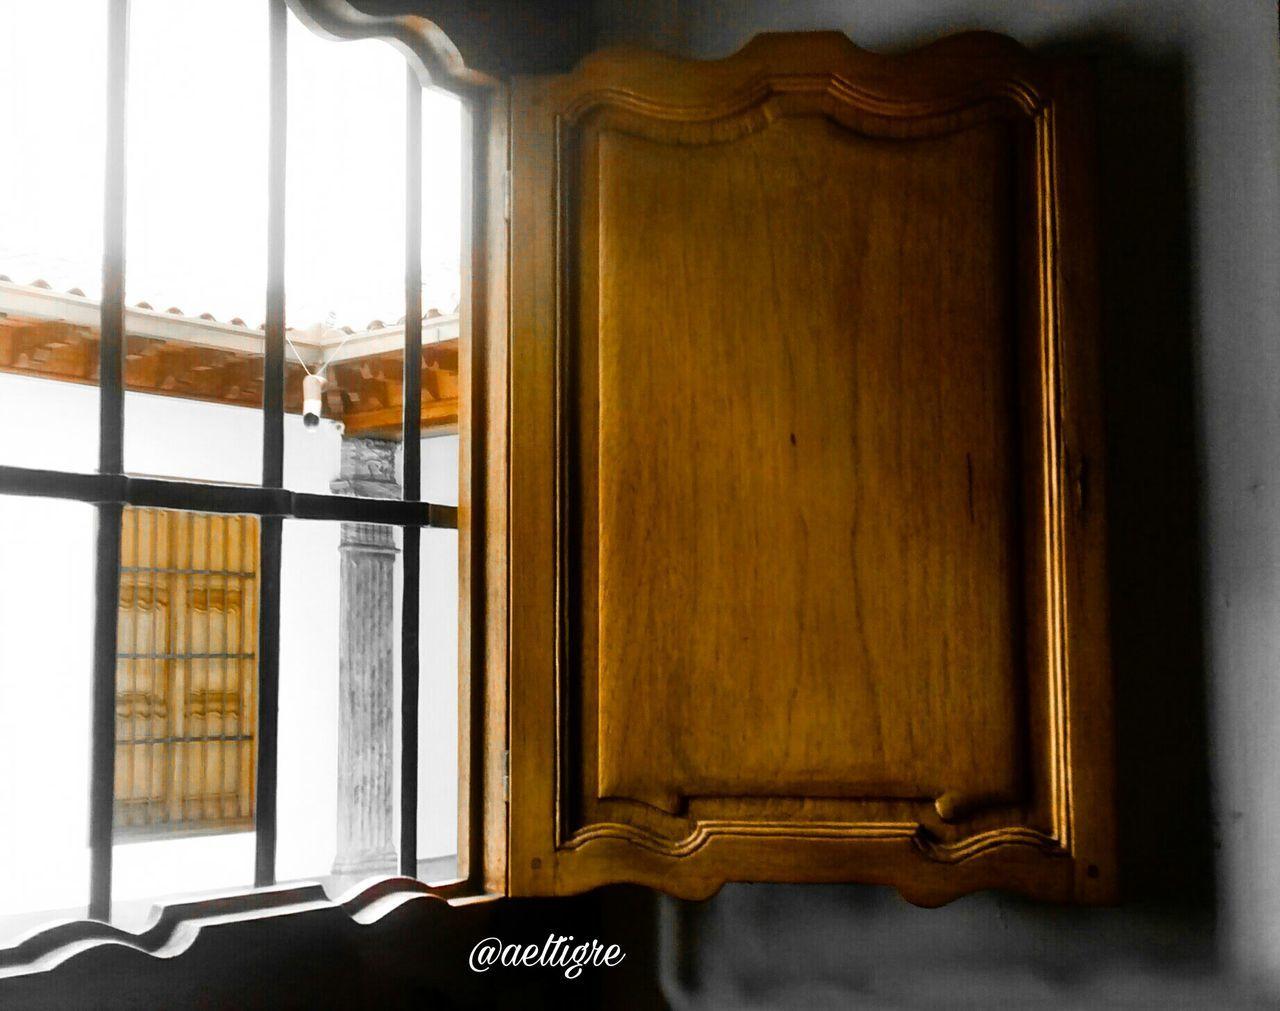 window, indoors, door, no people, close-up, day, architecture